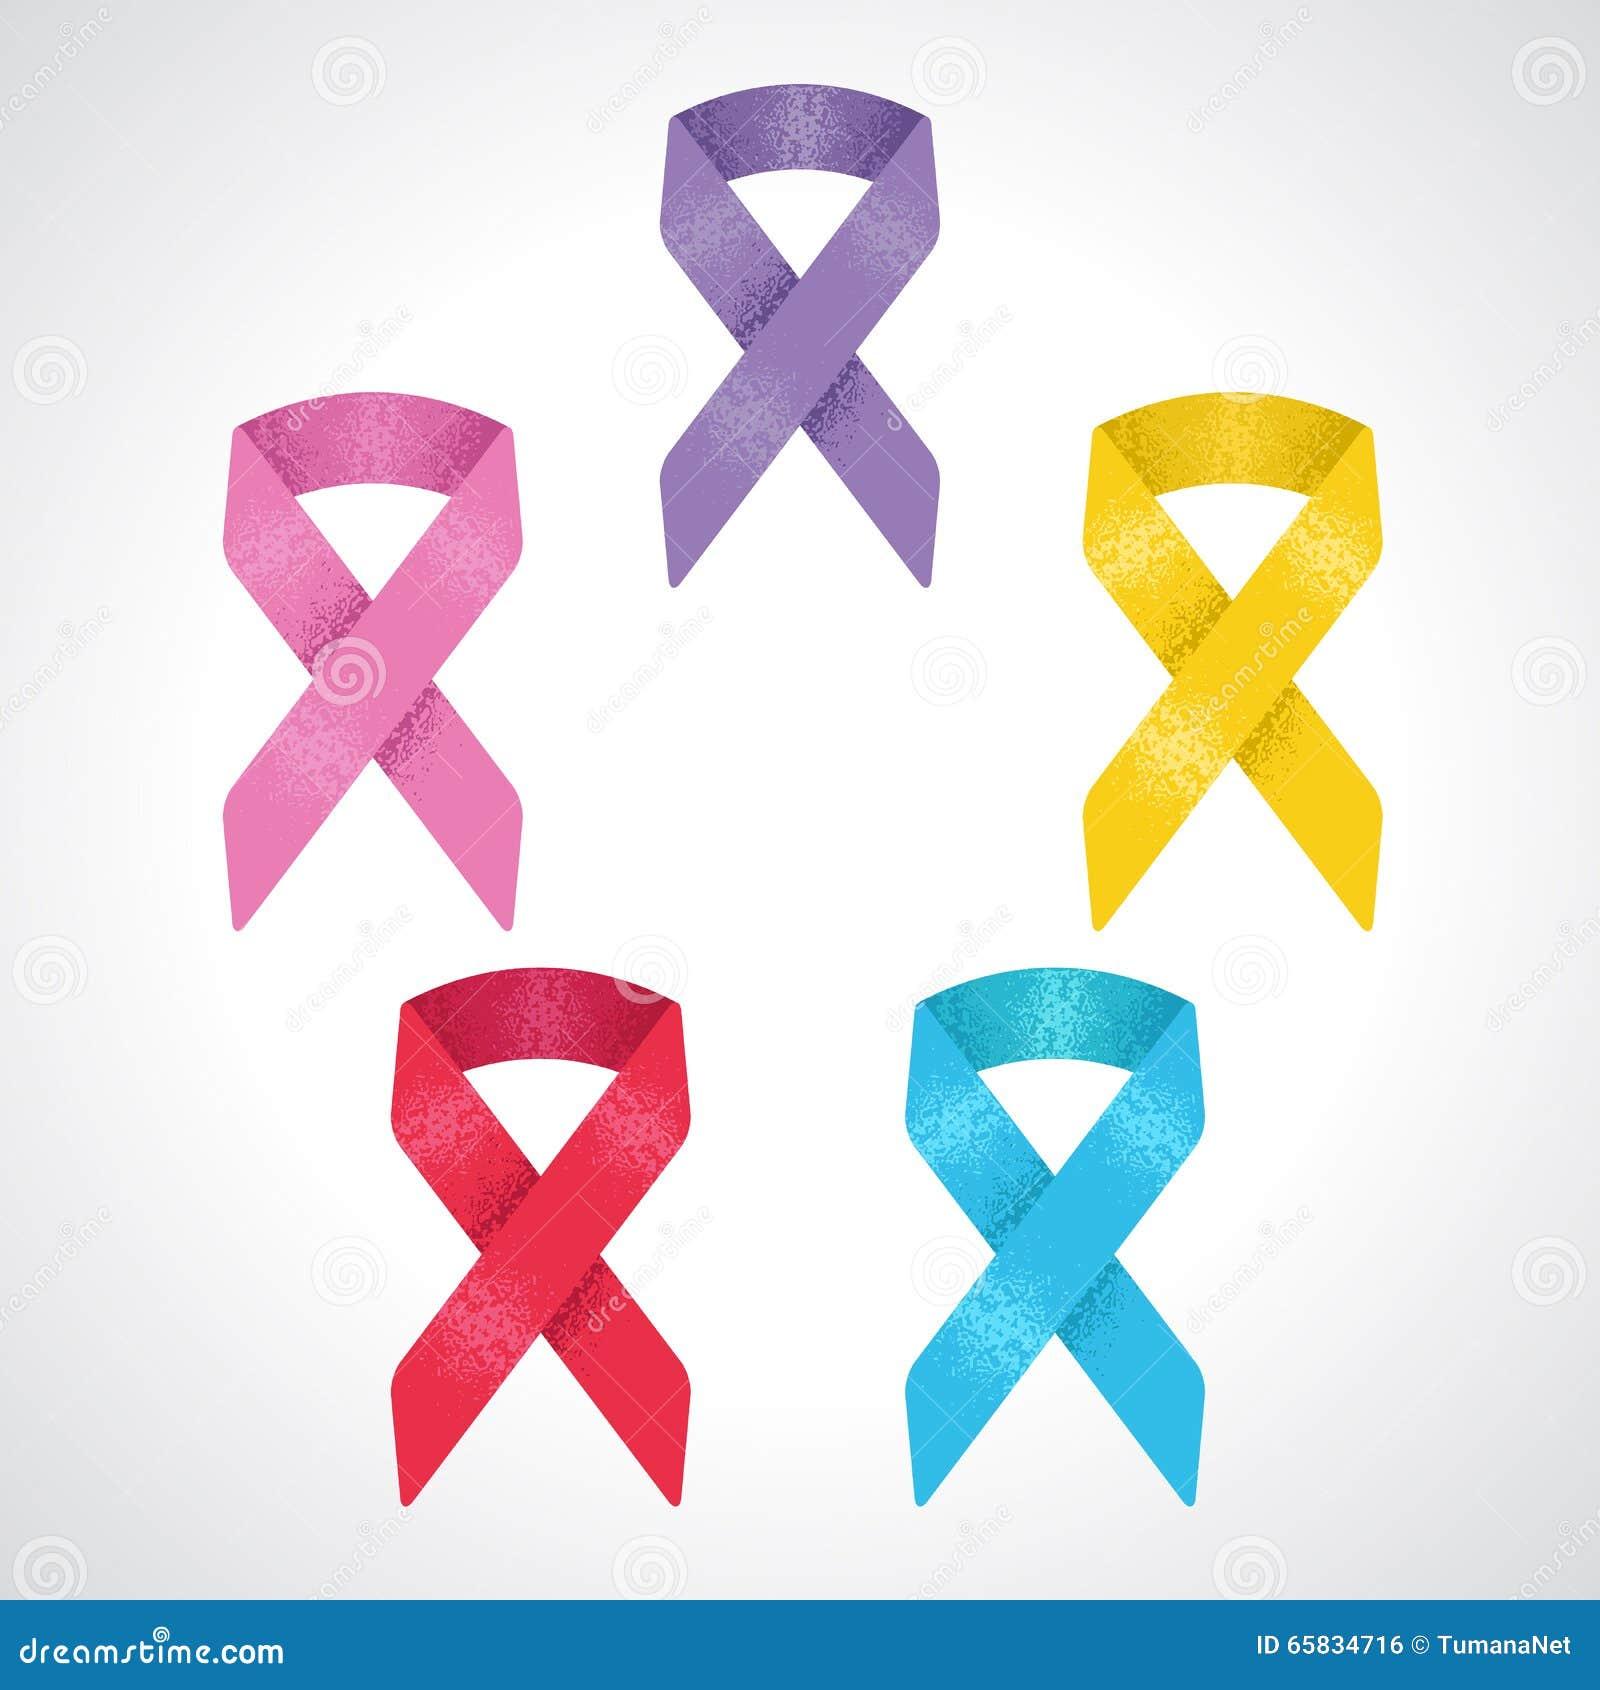 niño con cáncer de próstata